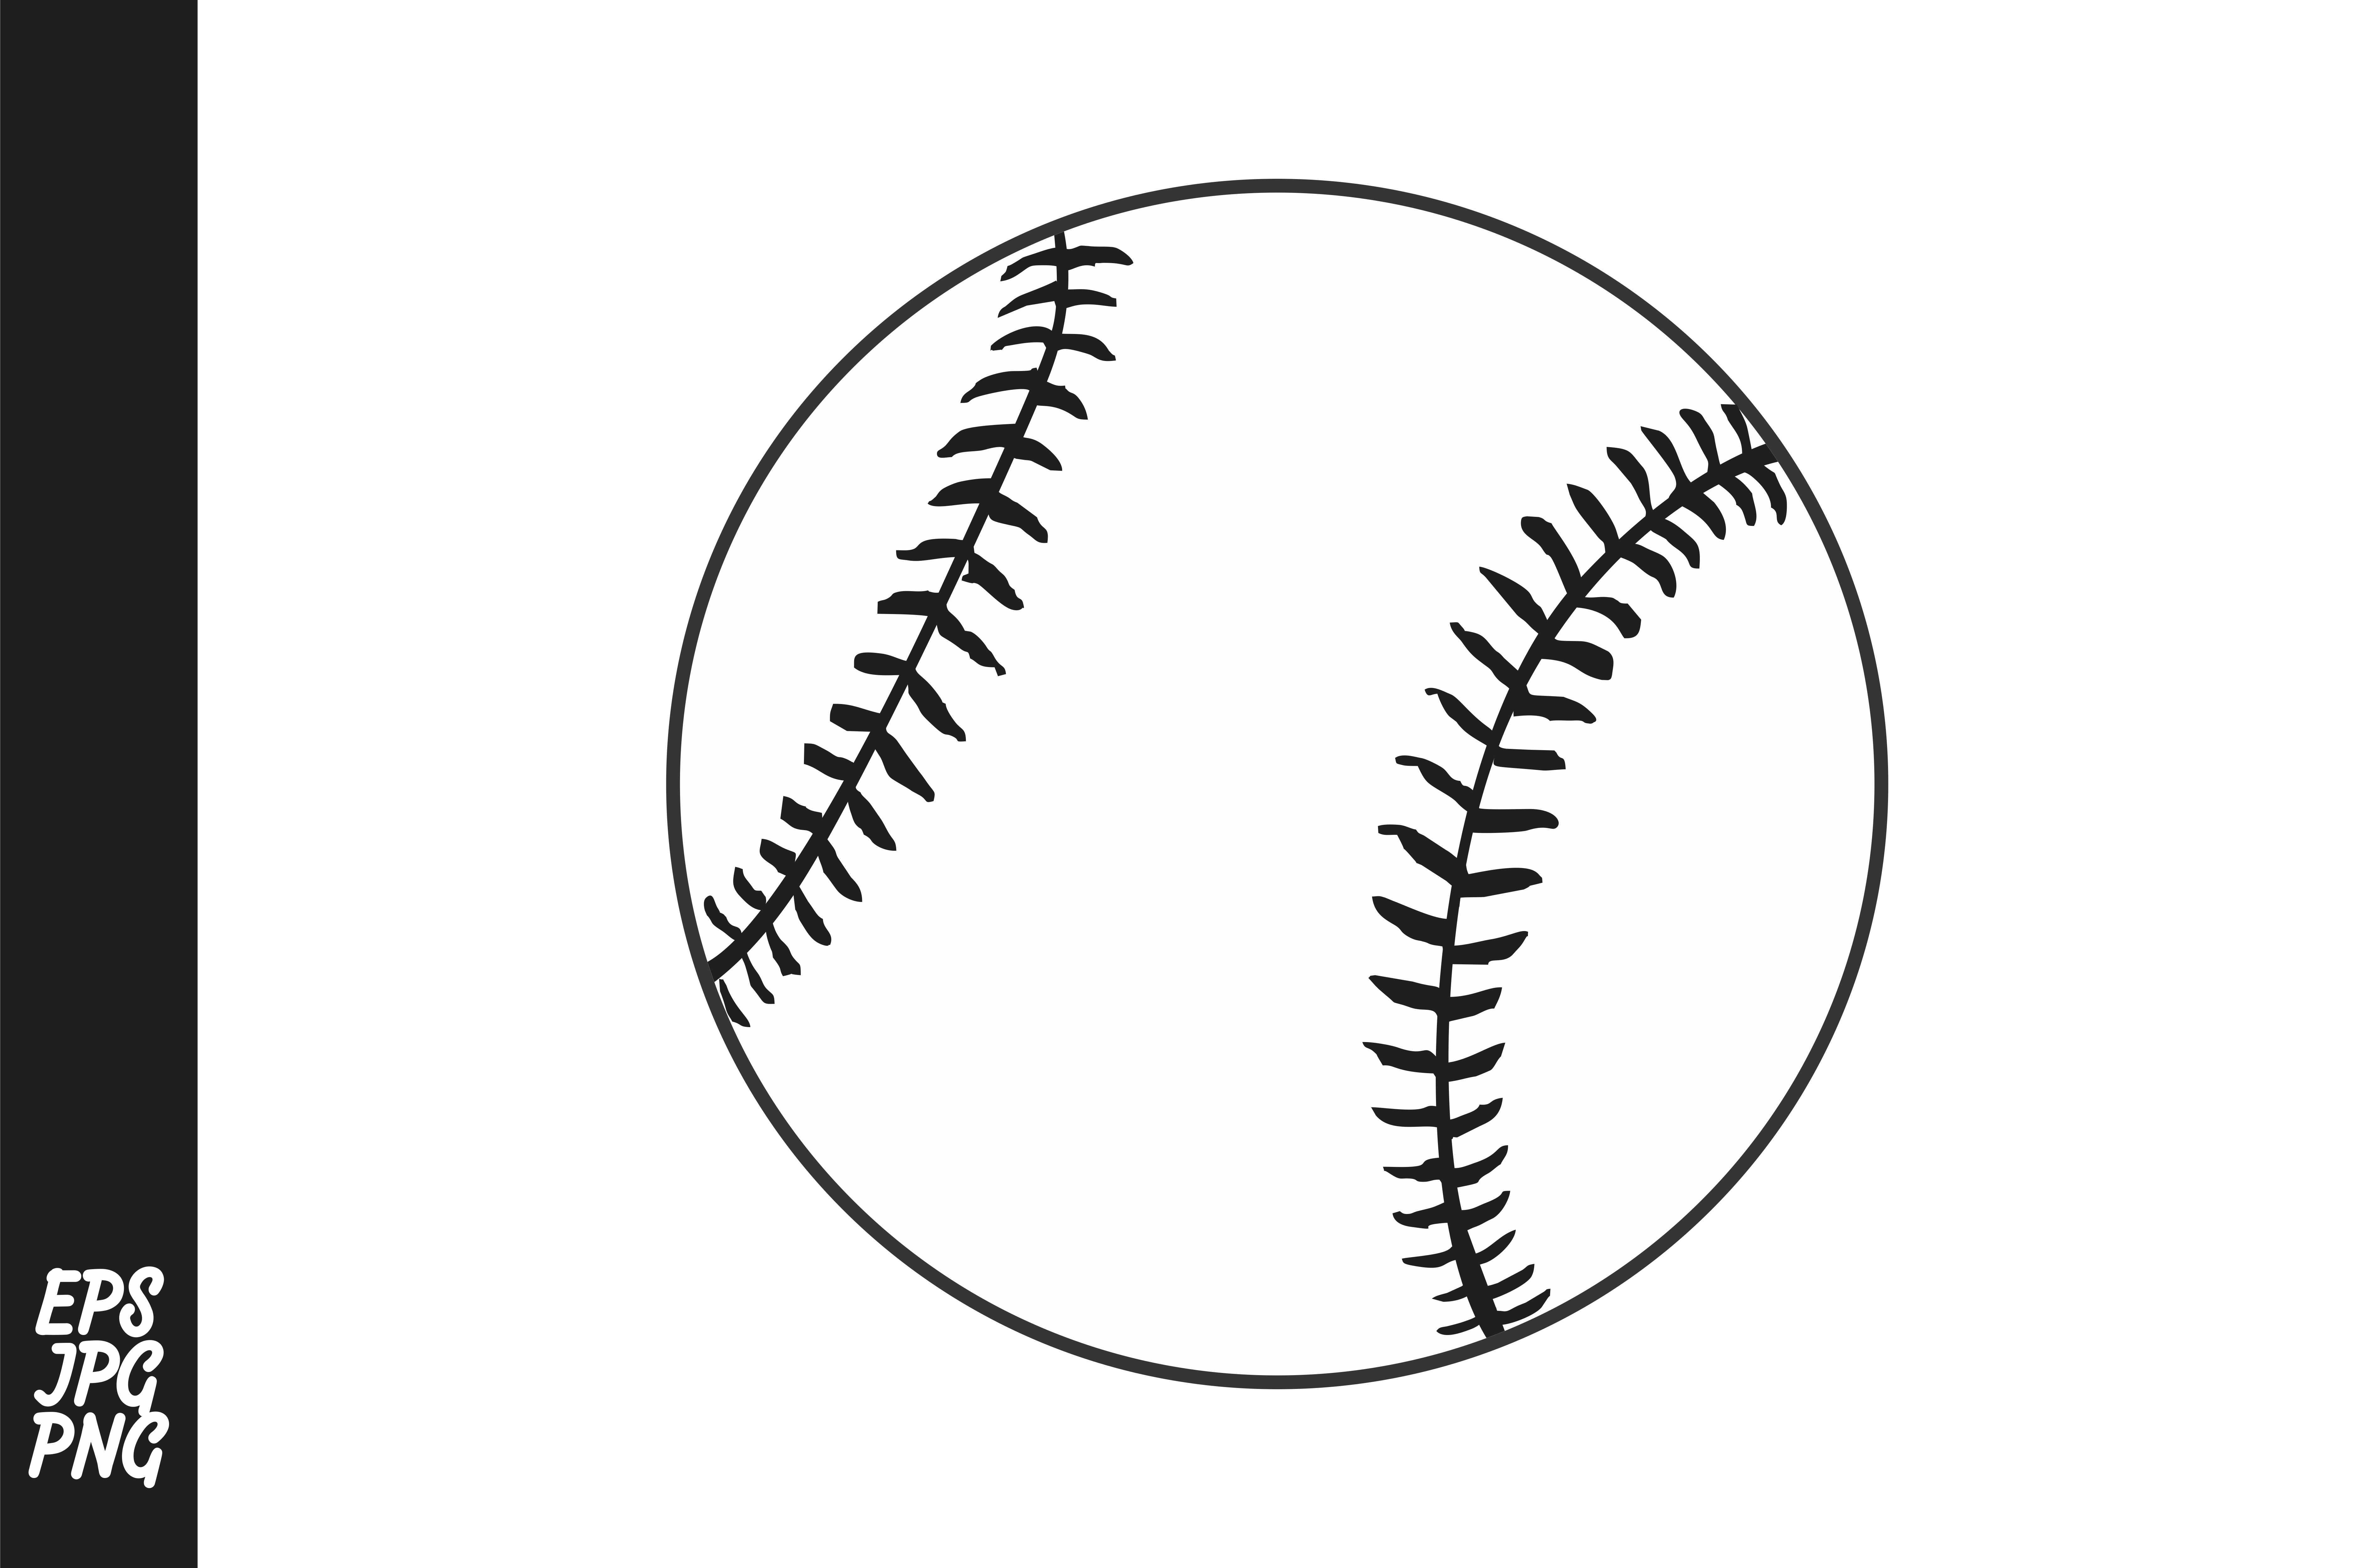 Baseball Vector Png Graphic By Arief Sapta Adjie Creative Fabrica